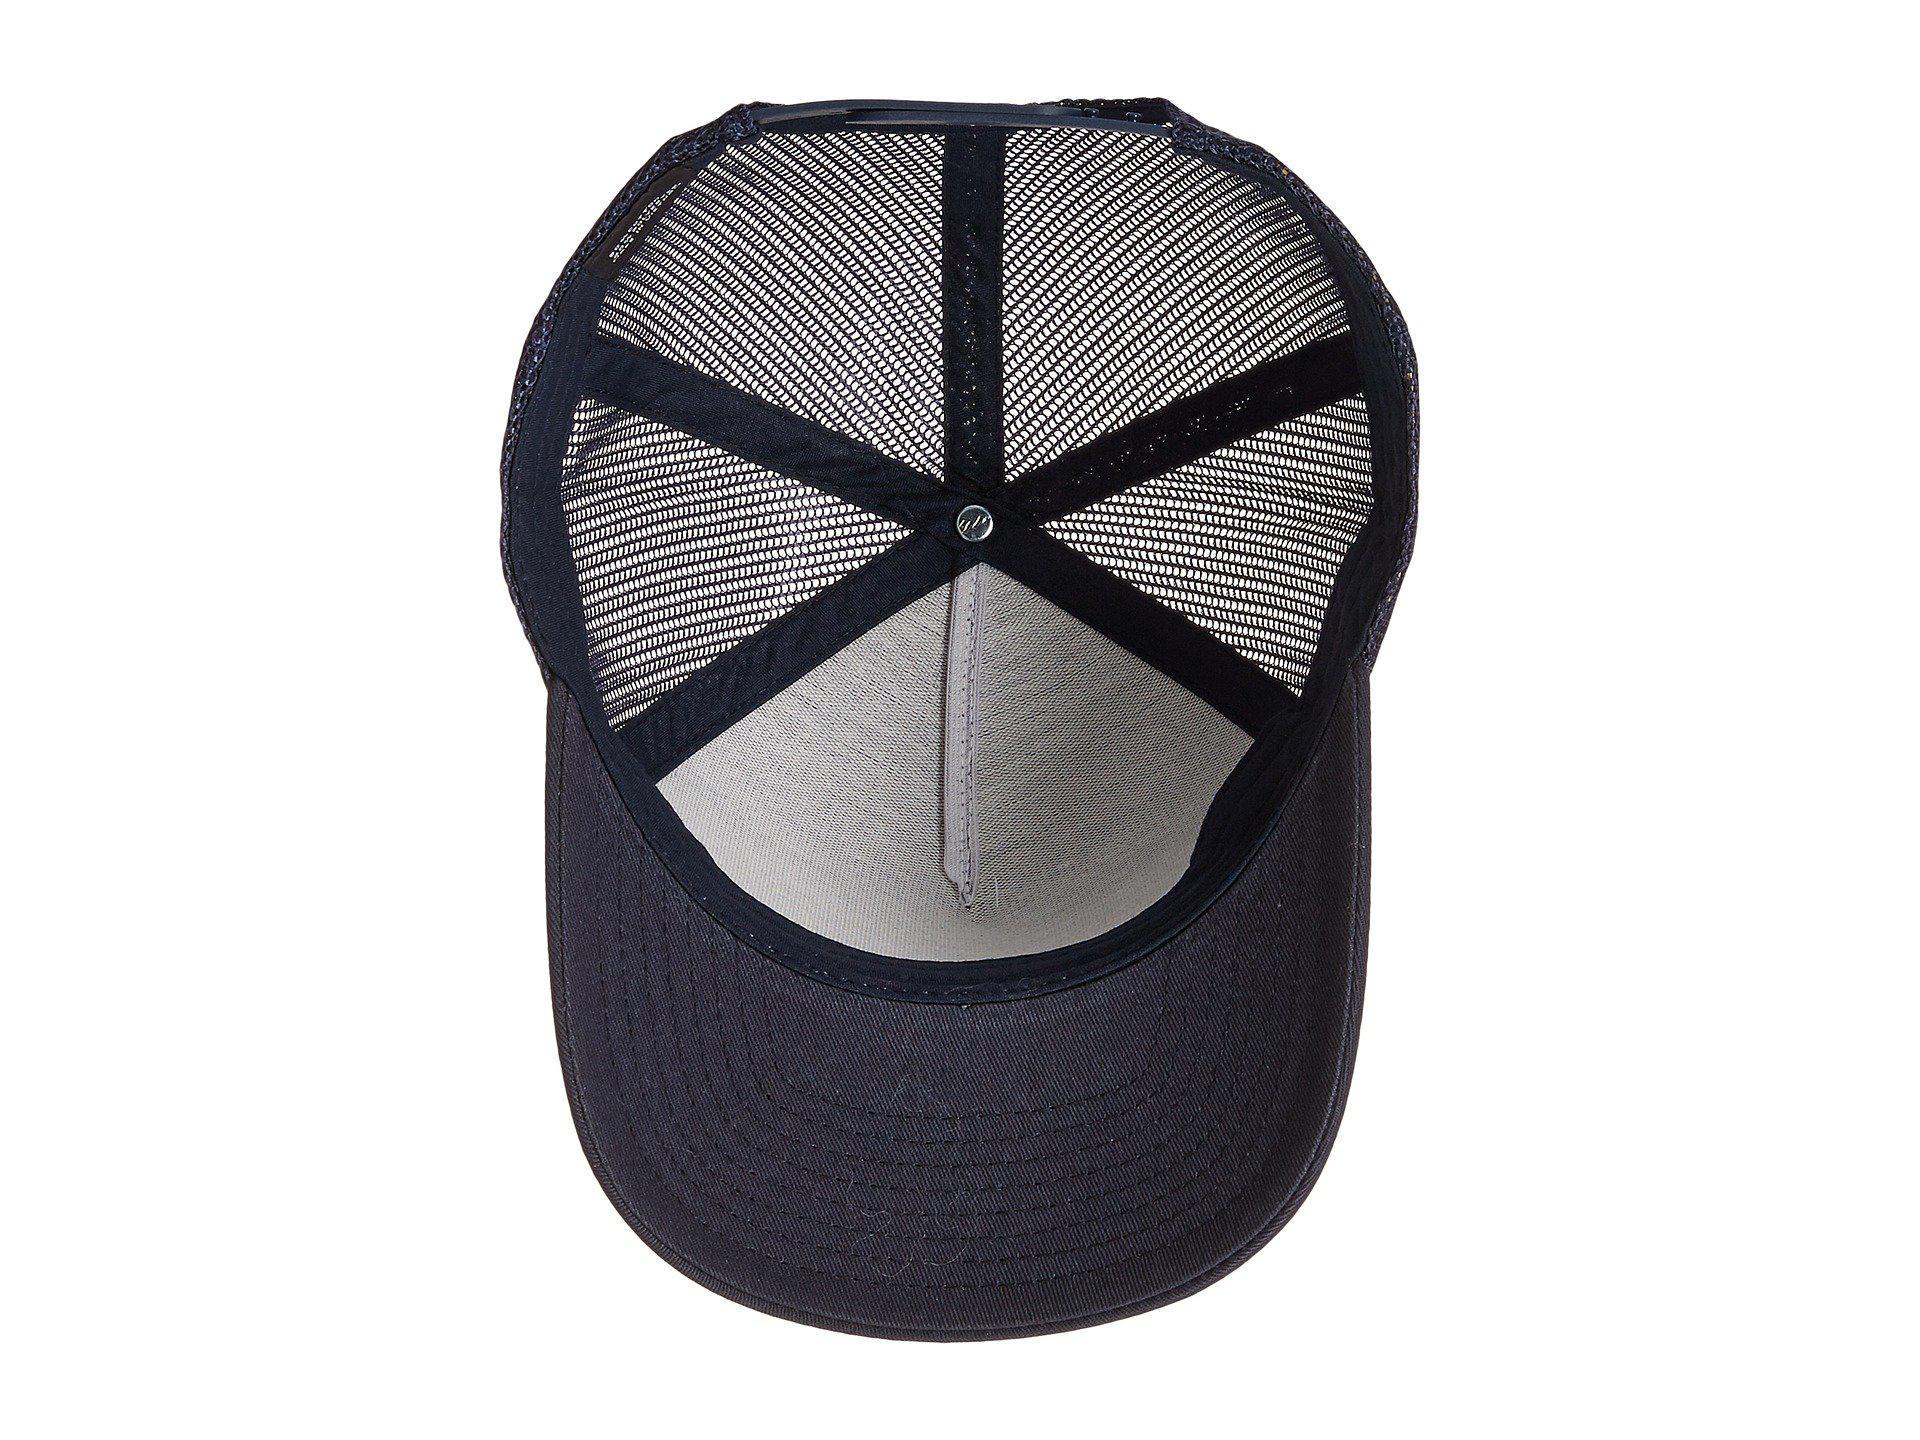 newest collection 9eba7 bbc4a buy travis mathew braids flexfit cap d87f7 f3b77  get lyst travis mathew  hoover hat in blue for men 58c9d 847cf